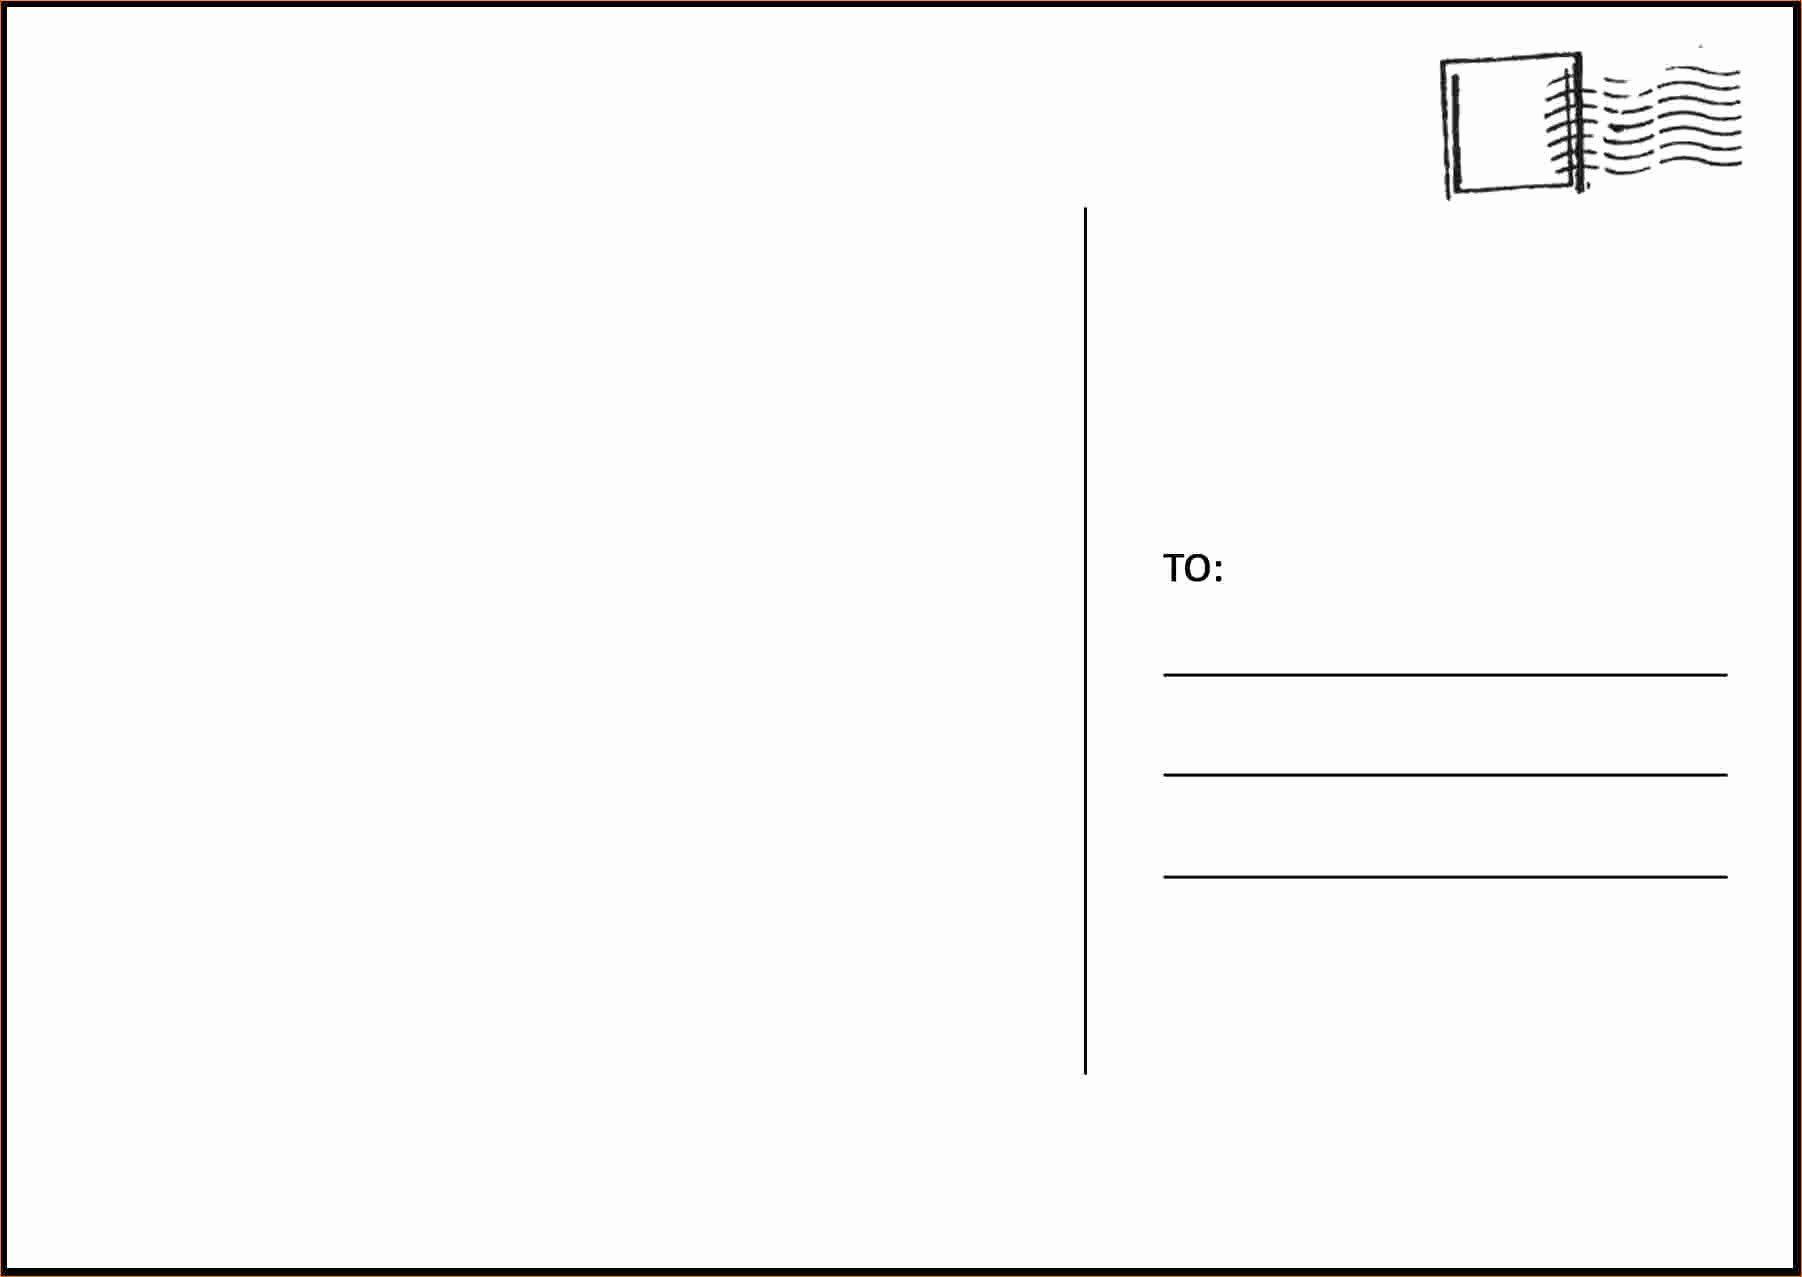 Microsoft Word 4x6 Postcard Template Elegant 4x6 Postcard Template Word Archives 2019 Calendar Postcard Template Free Printable Postcards Postcard Template